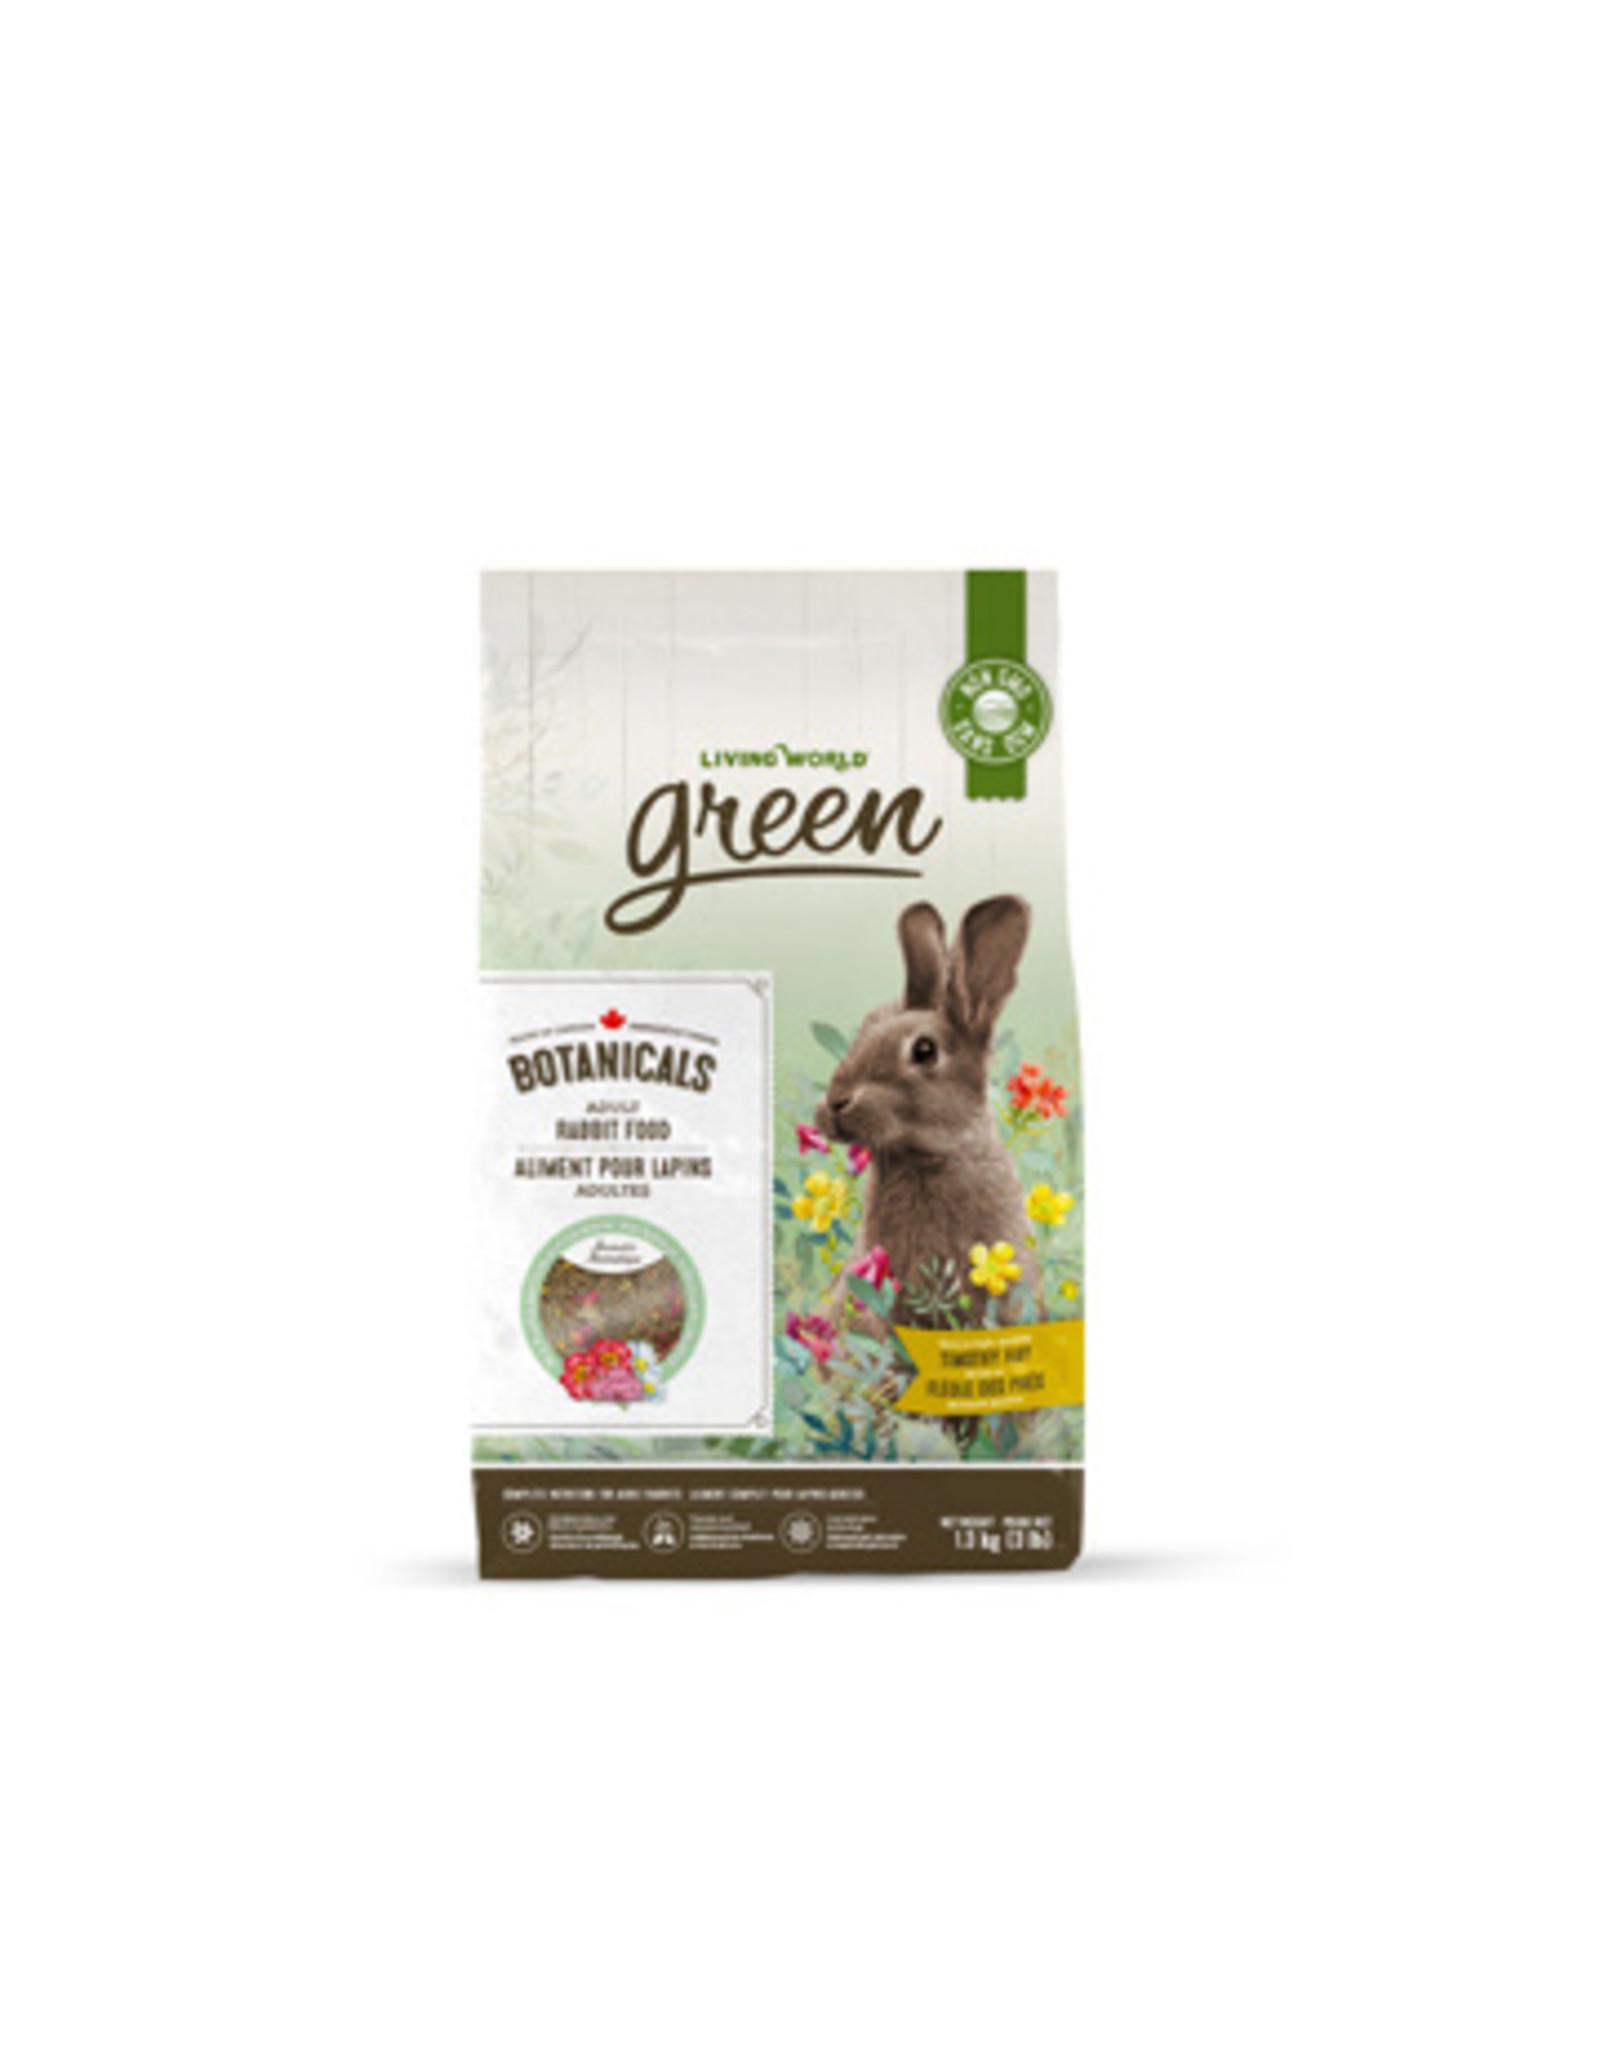 LW - Living World Living World Green Botanicals Adult Rabbit Food